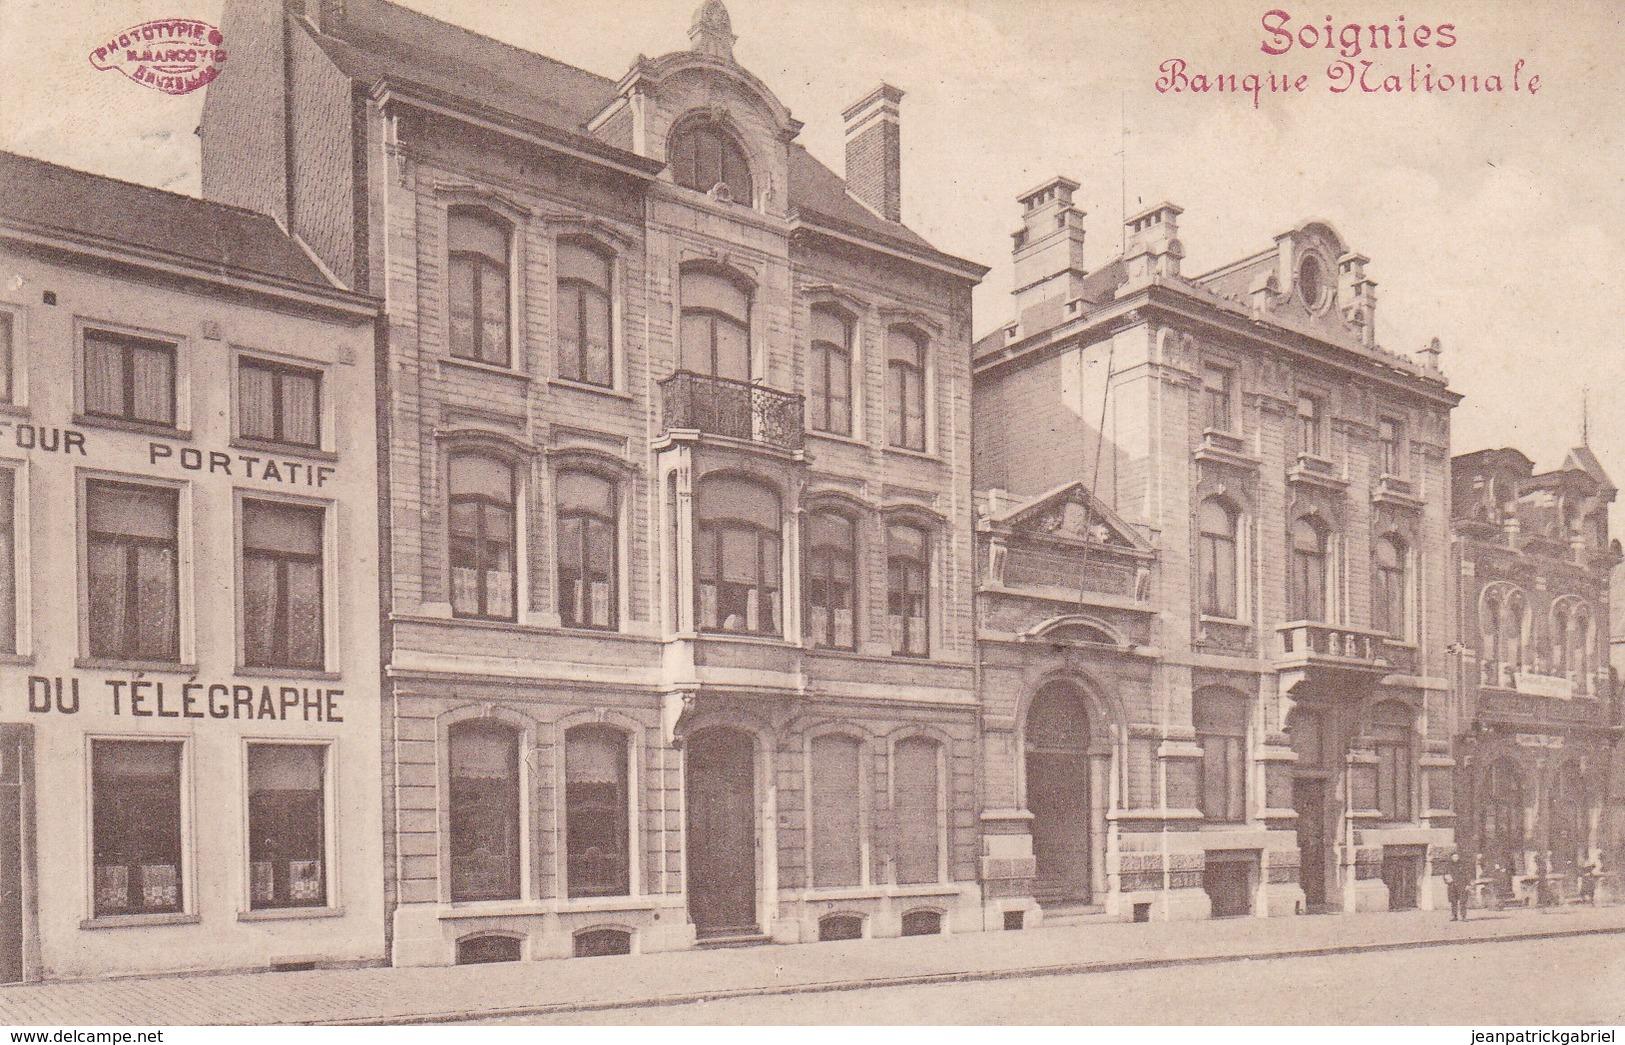 619 Soignies Banque Nationale - Soignies